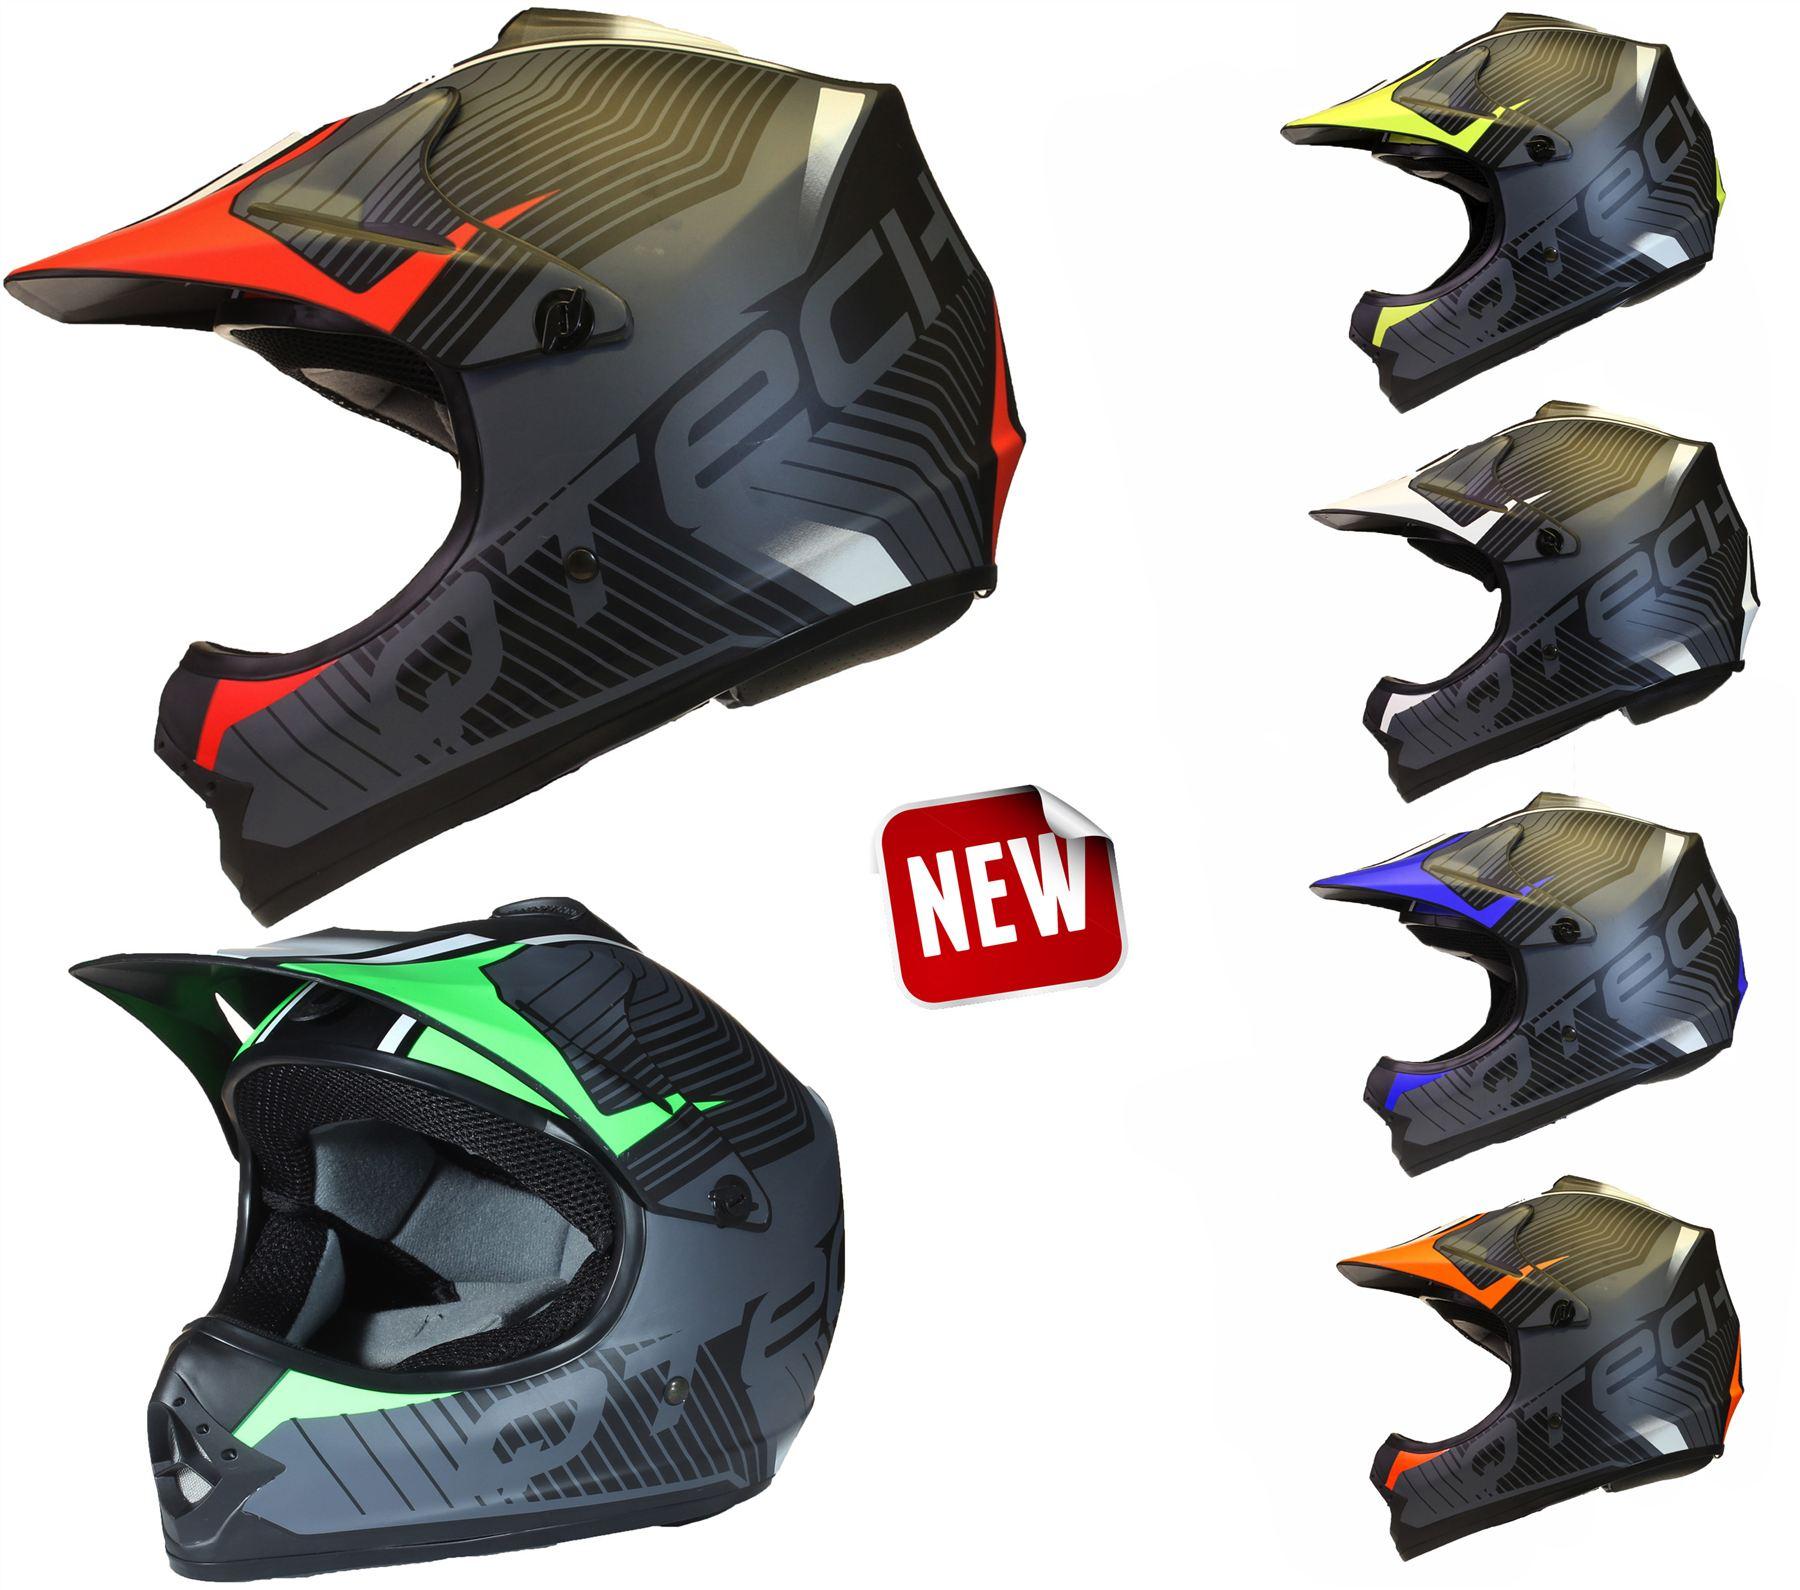 Small Qtech Childrens KIDS MOTOCROSS MX Style Helmet BMX Quad Bike Spectre by Yellow